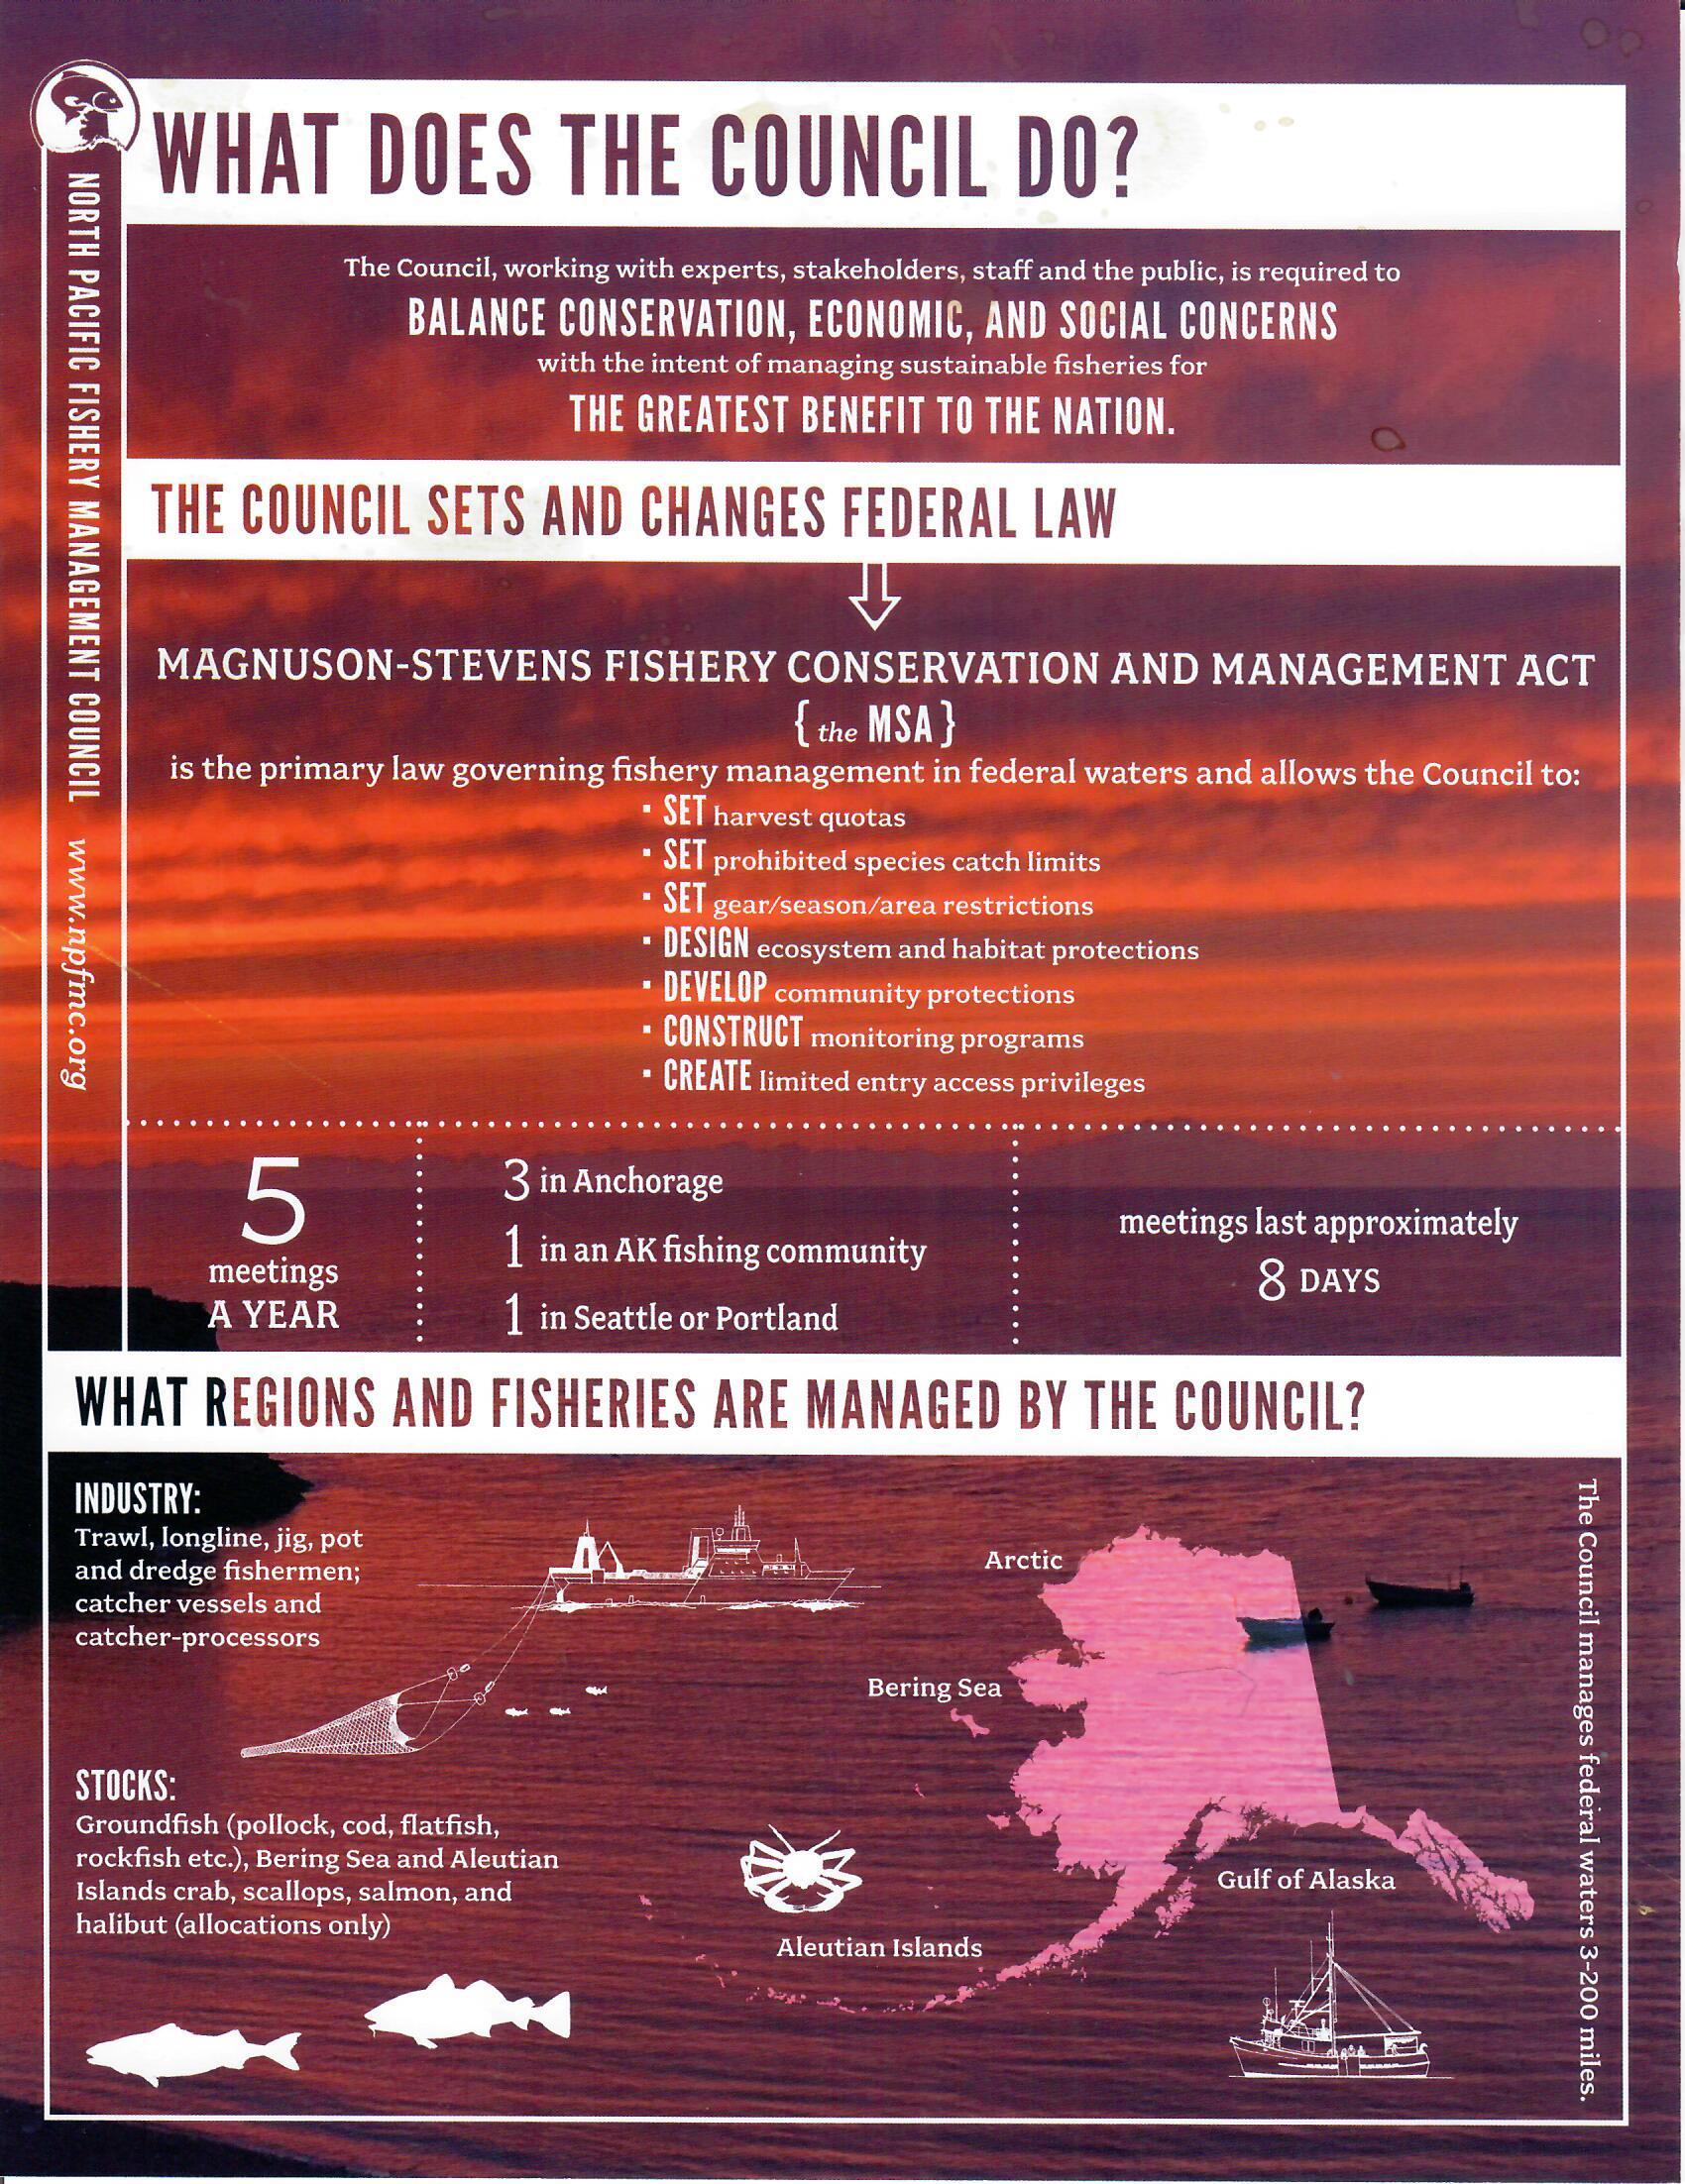 NPFMC Infographic 1.jpg